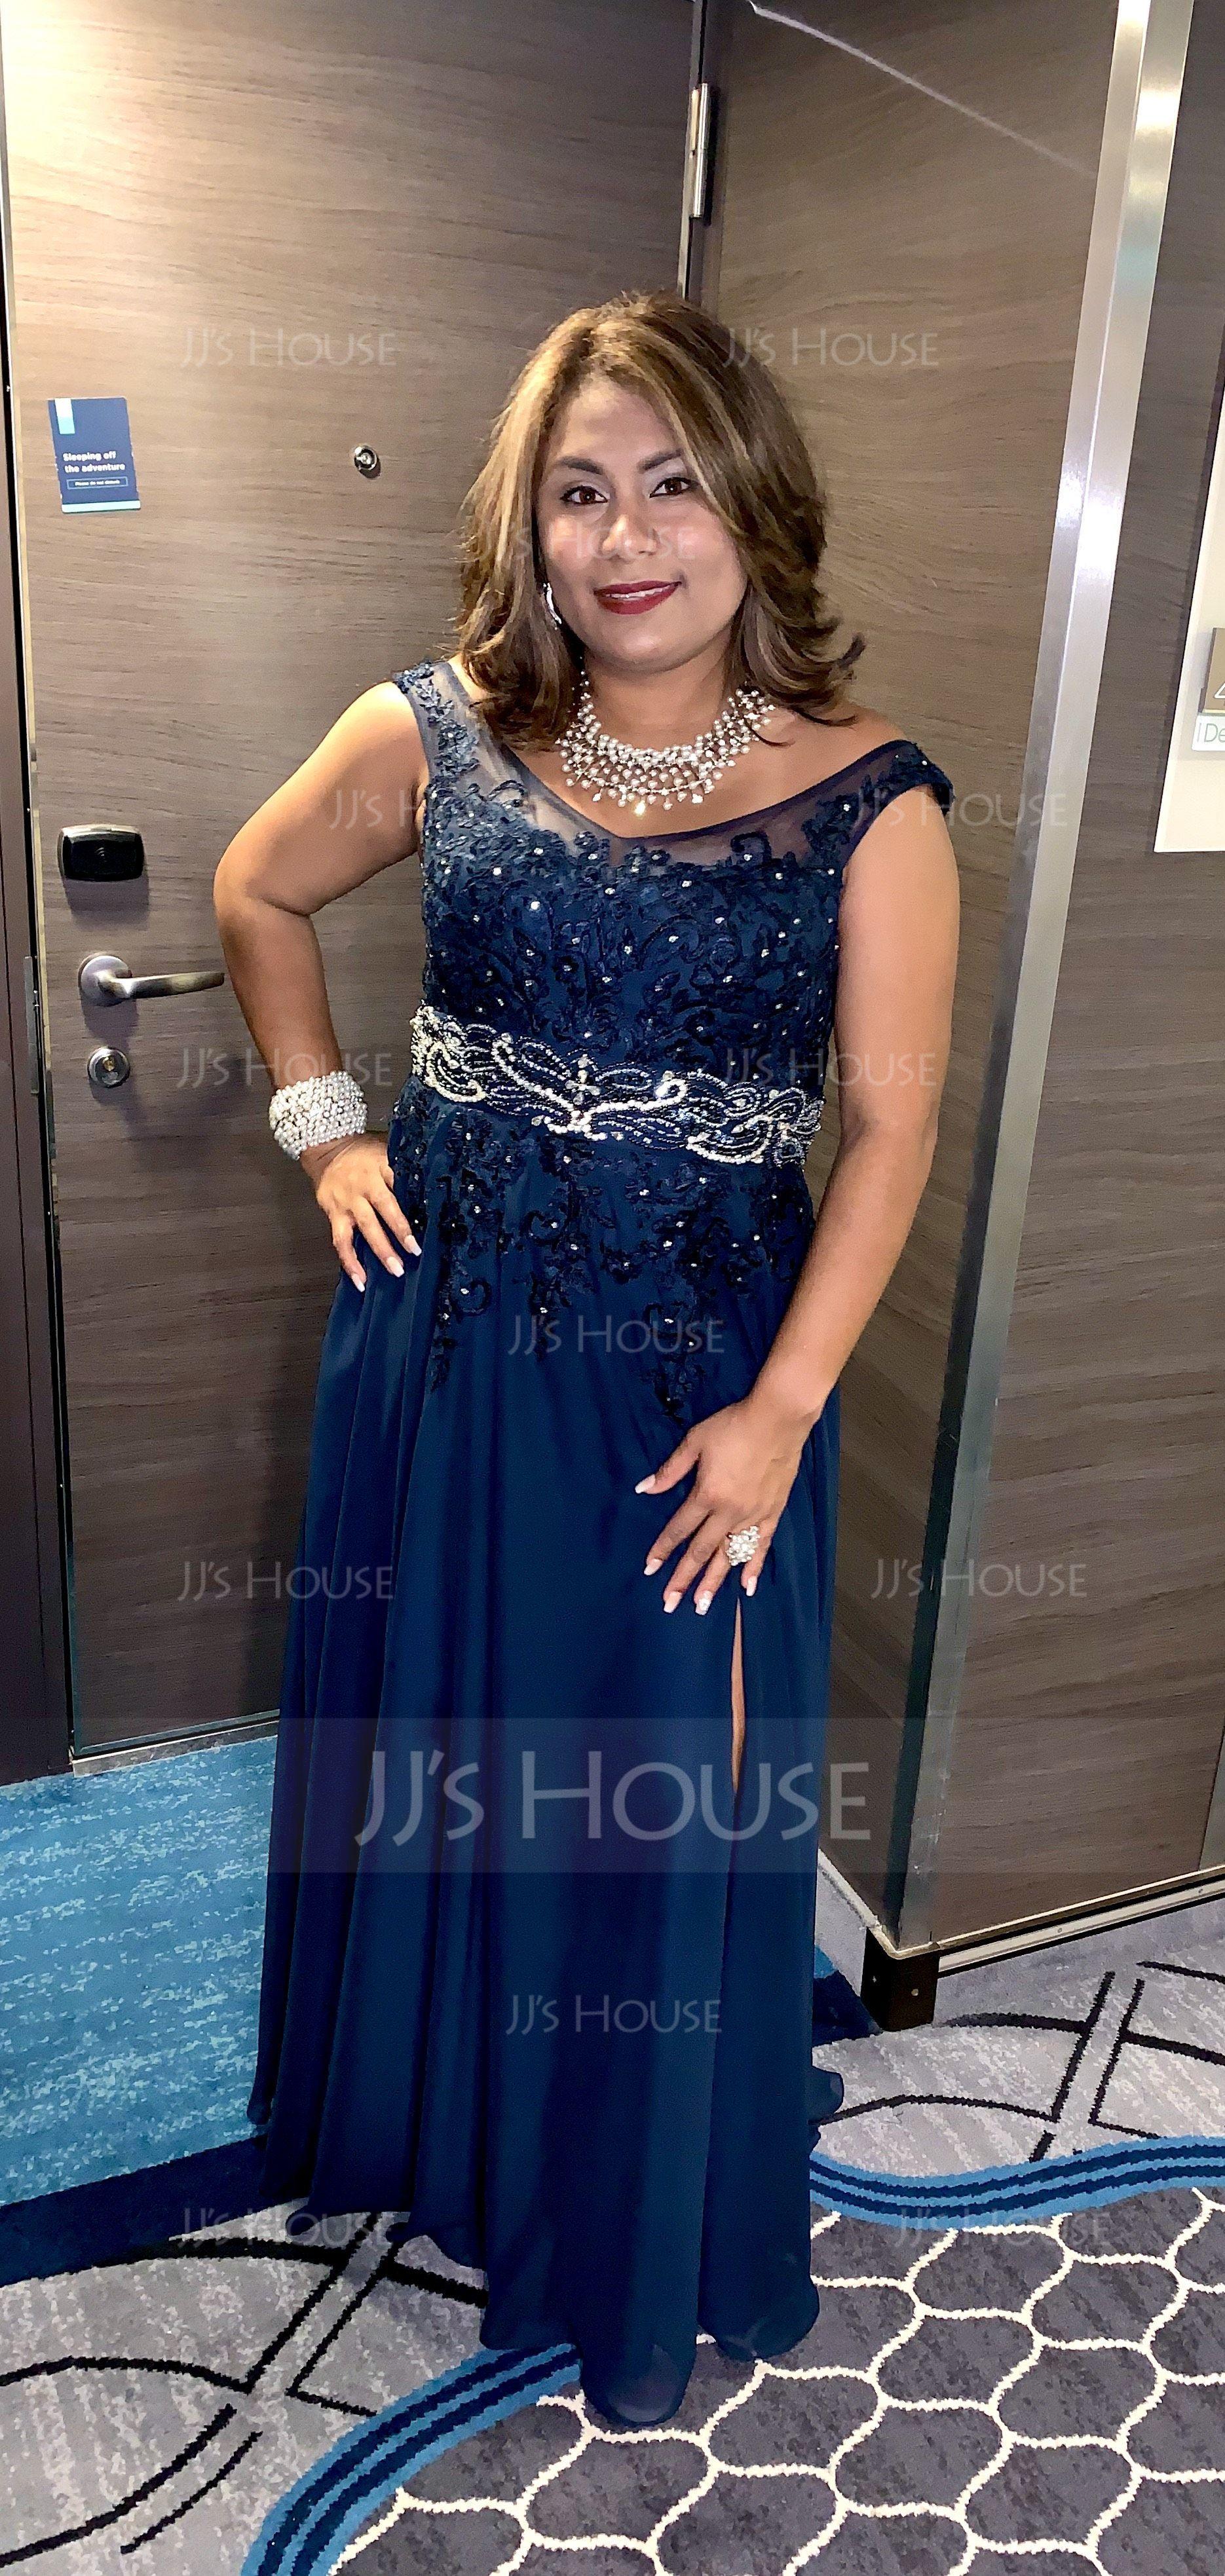 A-Line V-neck Floor-Length Chiffon Evening Dress With Beading Sequins (017167689)